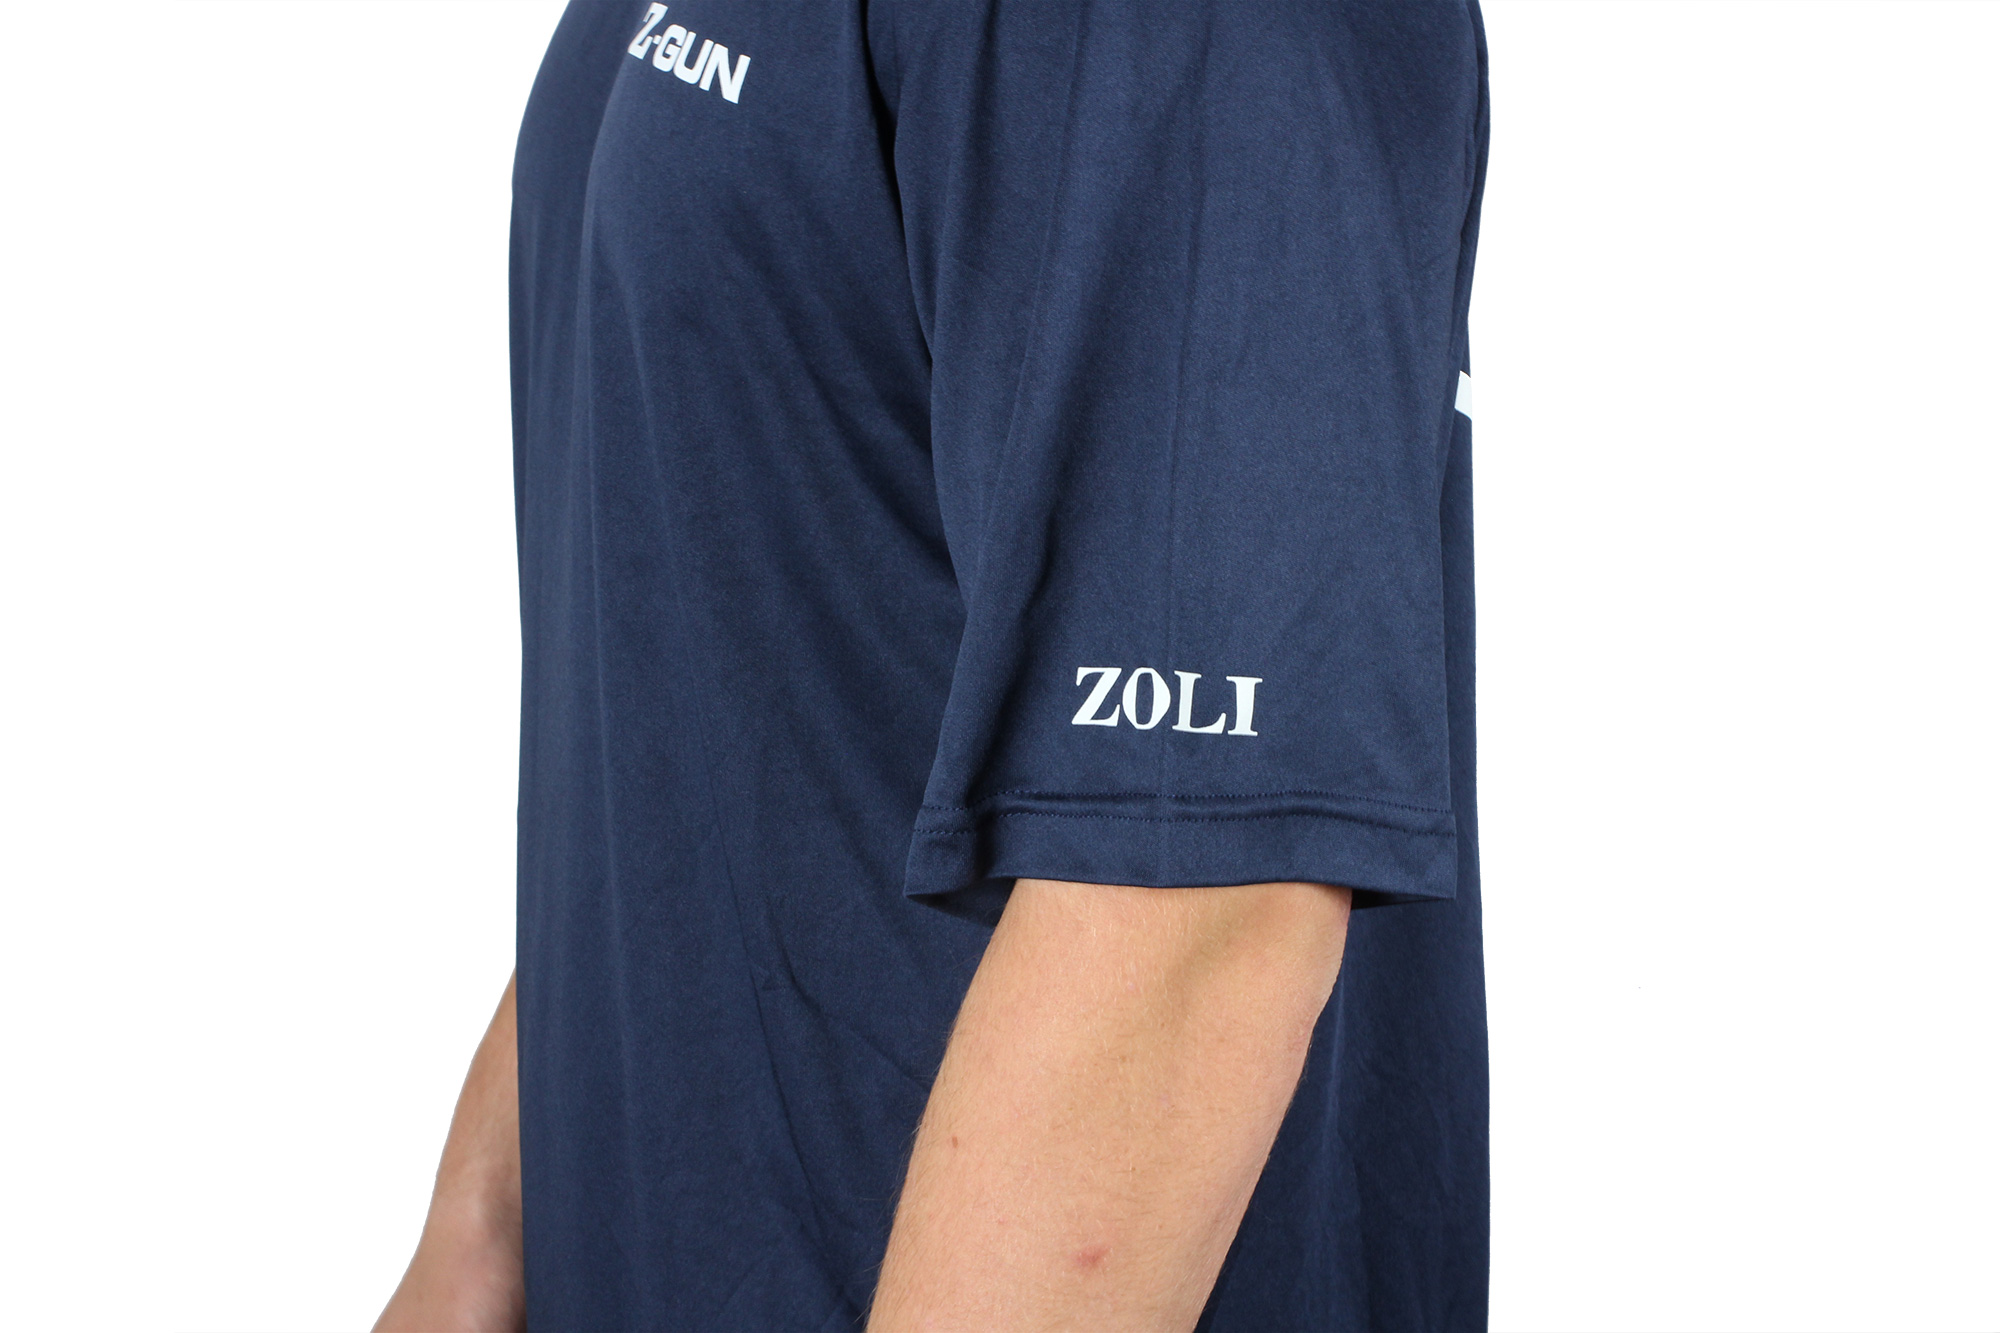 Zoli Z-GUN Navy Sport Shirt Leftside